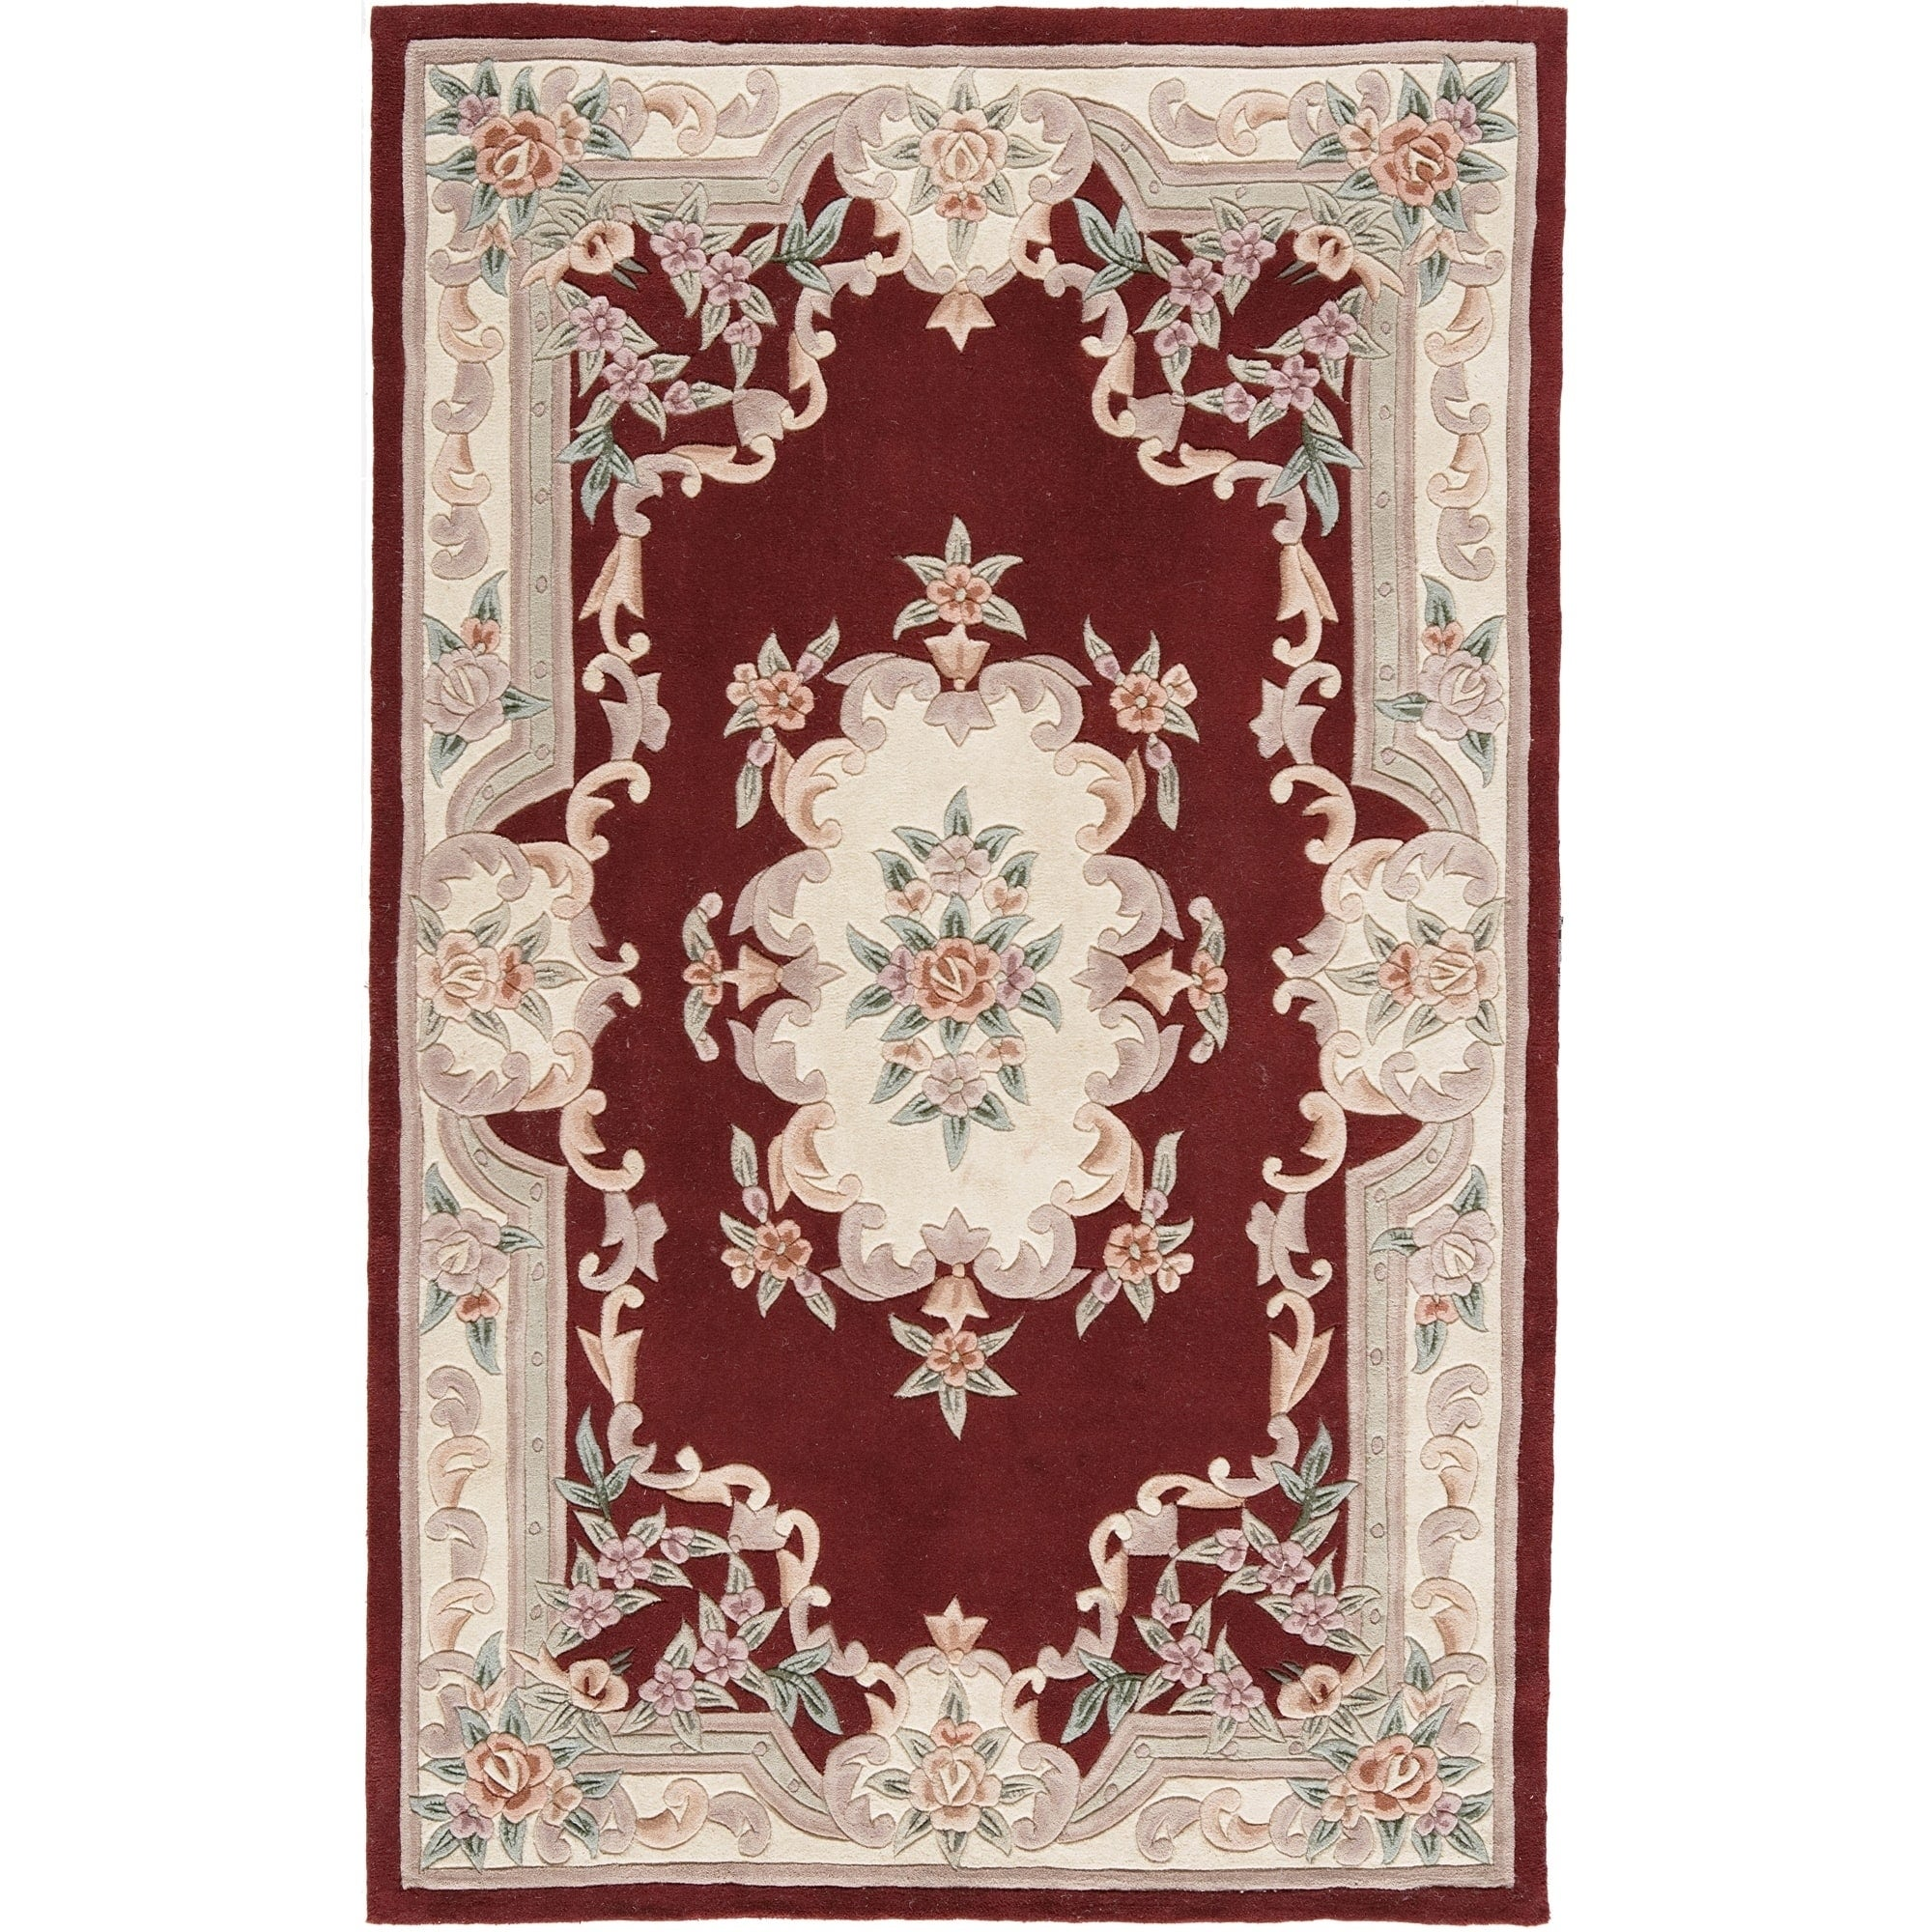 Bergen Hand Tufted Wool Oriental Area Rug 5 X 8 5 X 8 On Sale Overstock 9639013